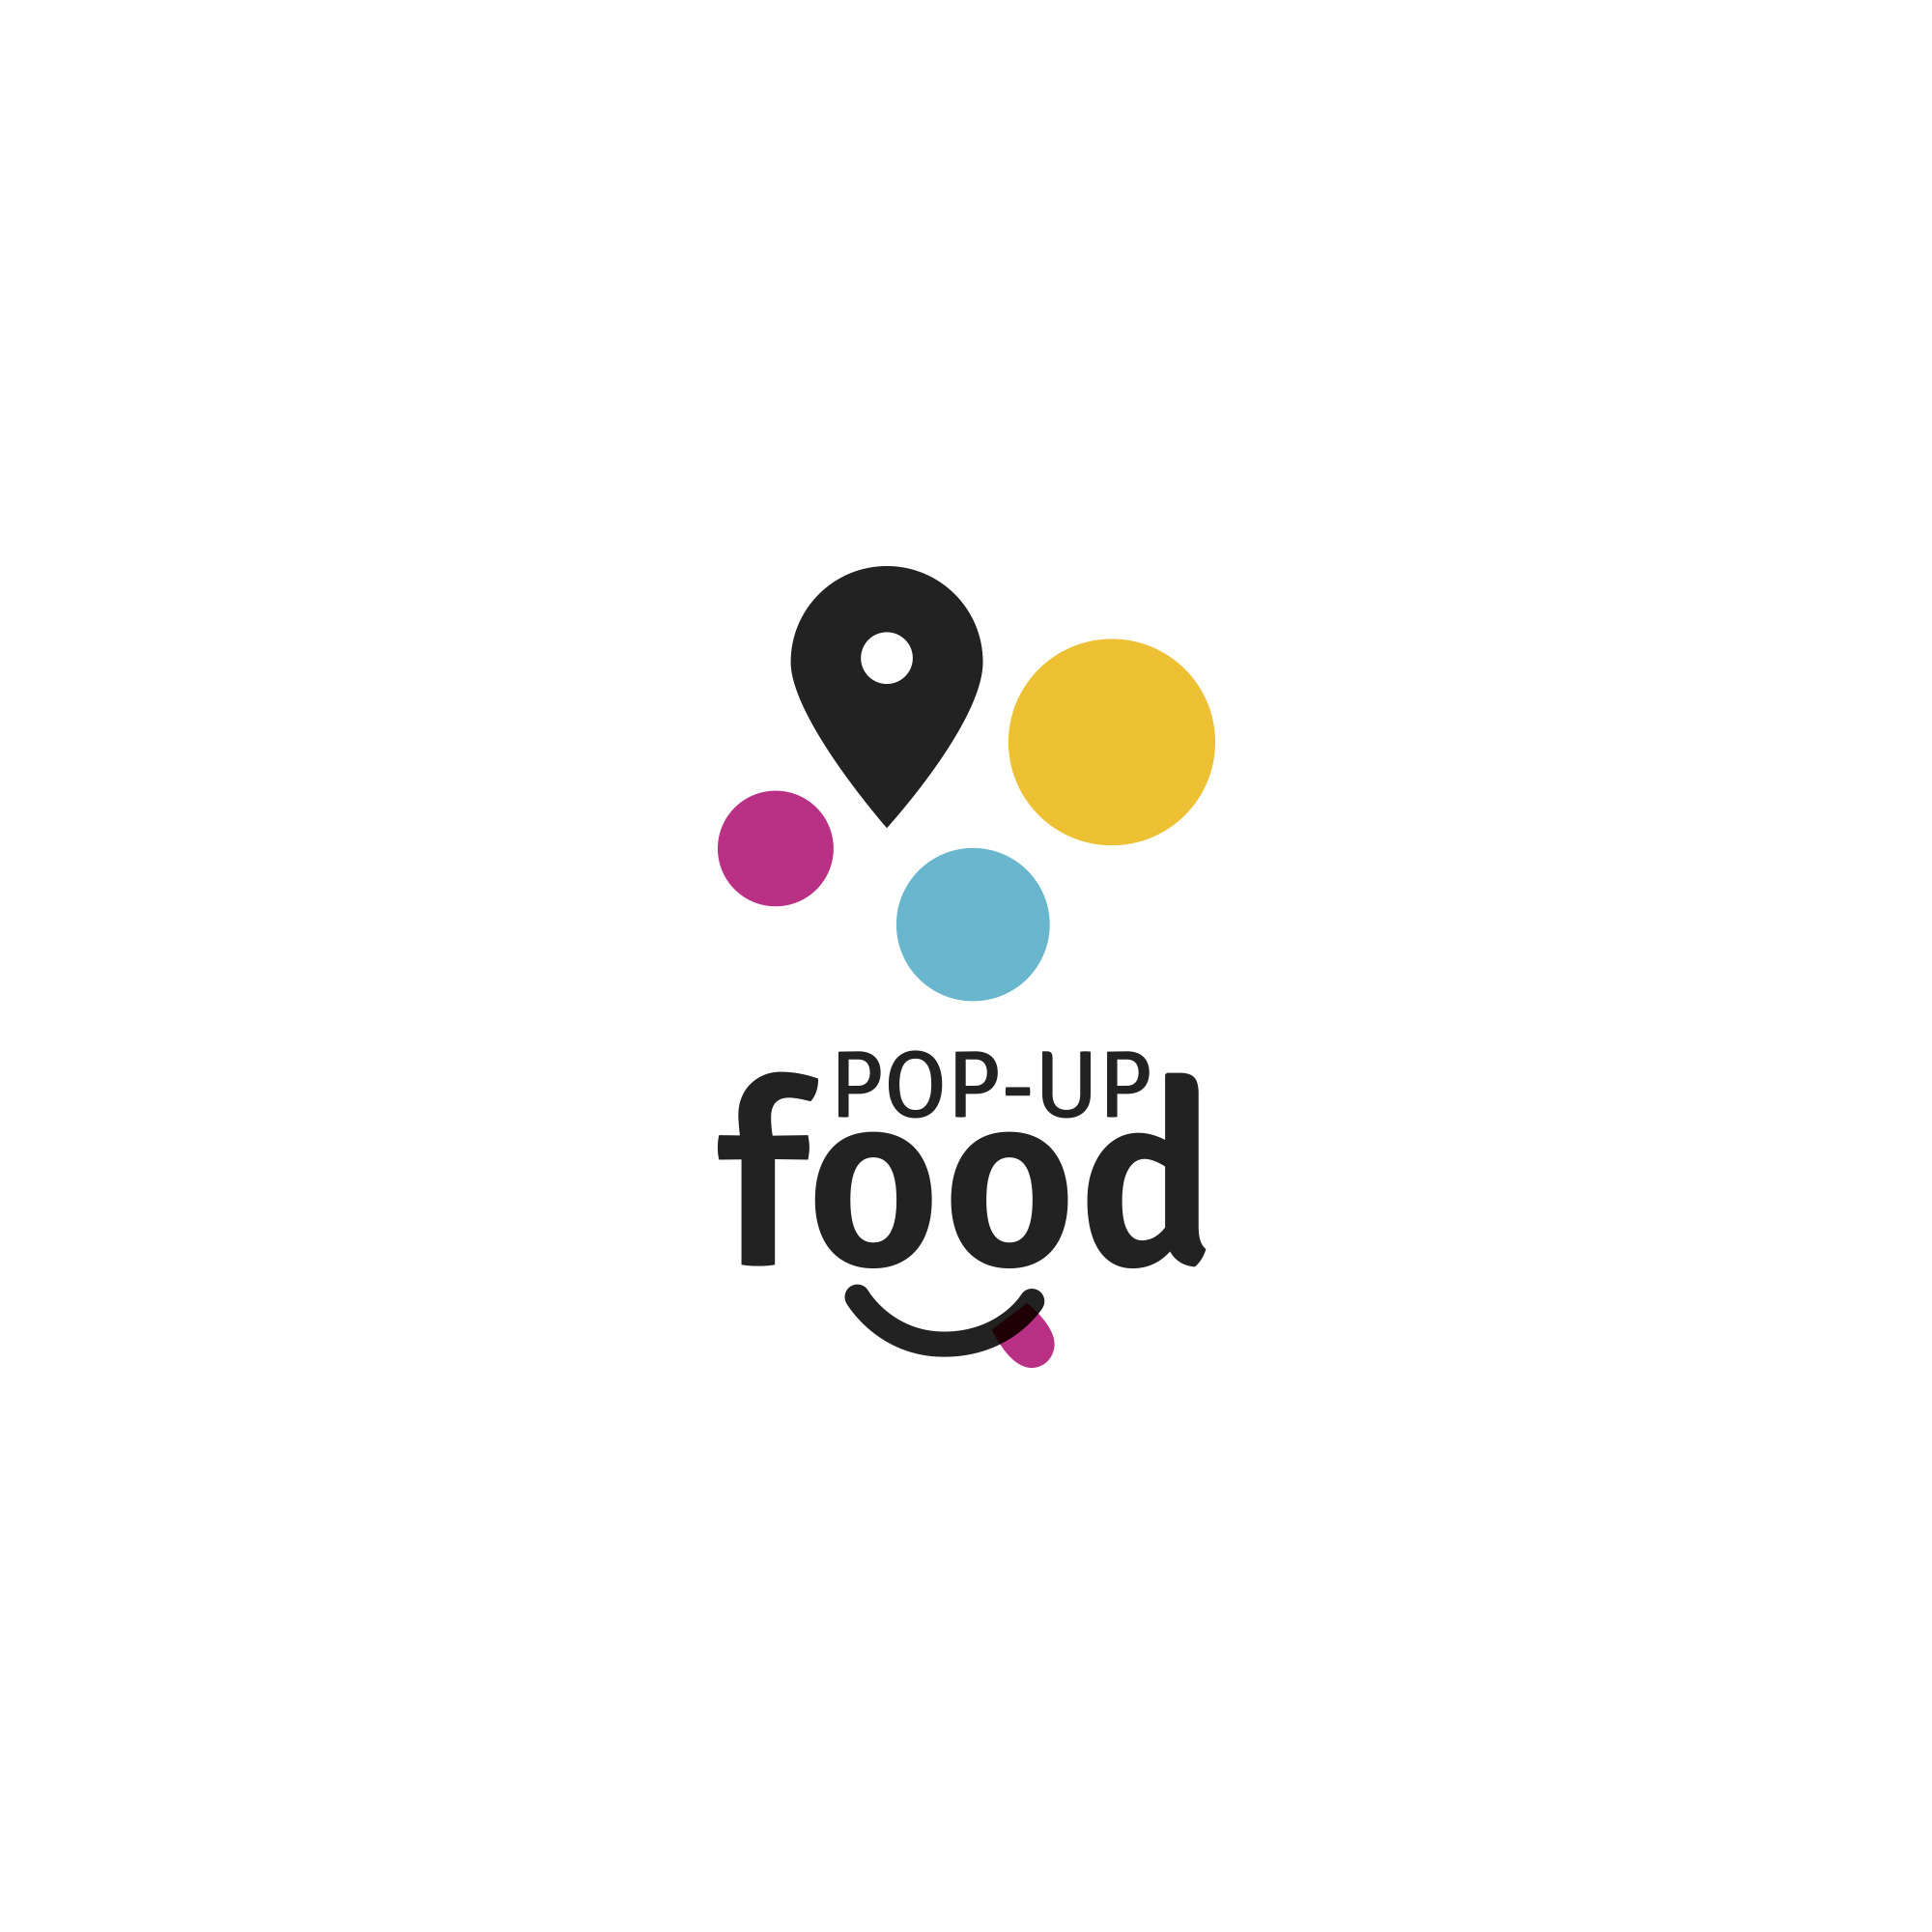 POP-UP food